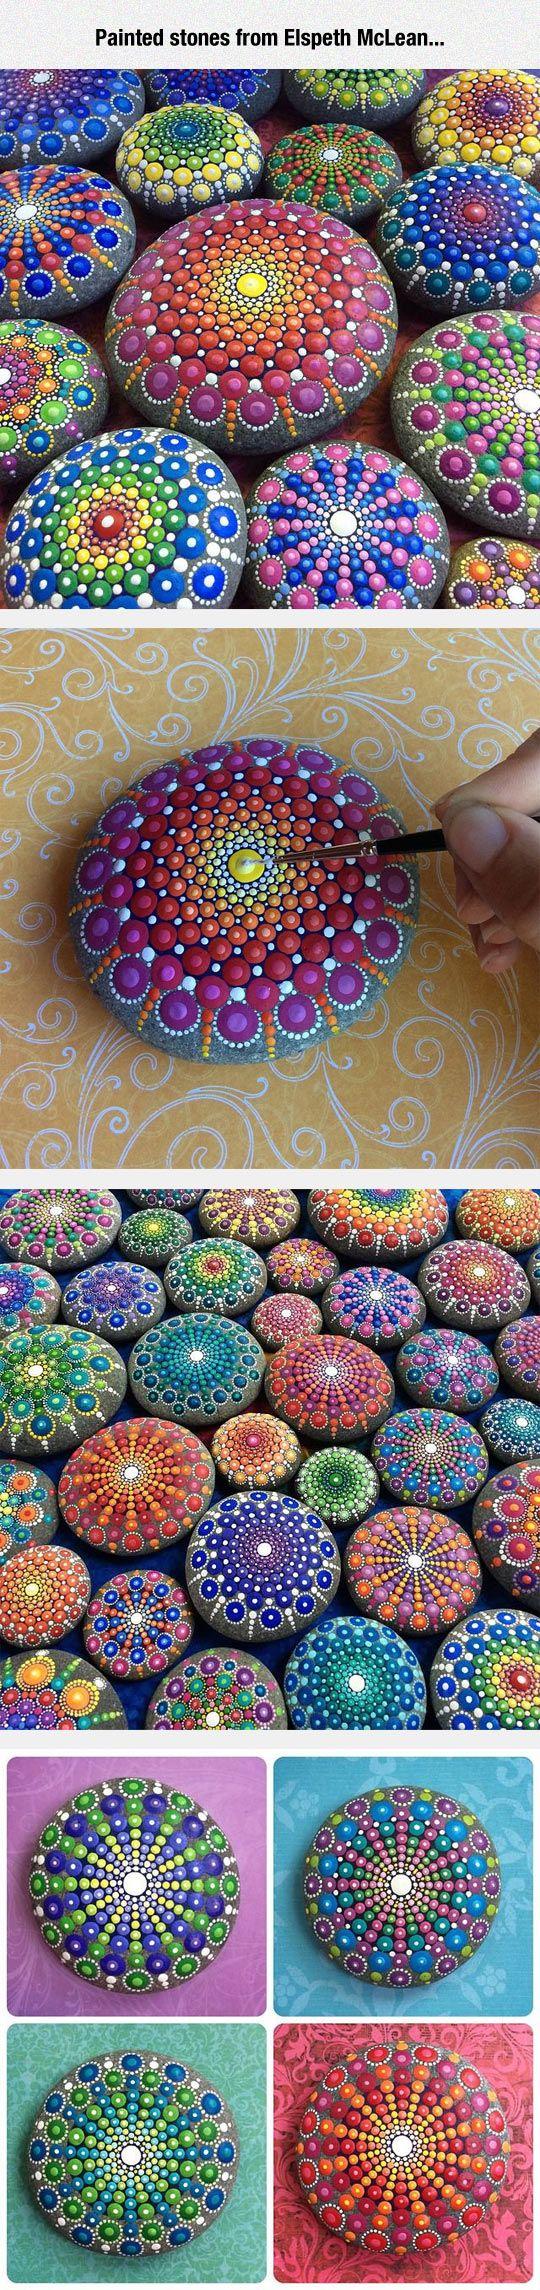 painted stones by elspeth mclean | cool-painted-stones-Elspeth-McLean